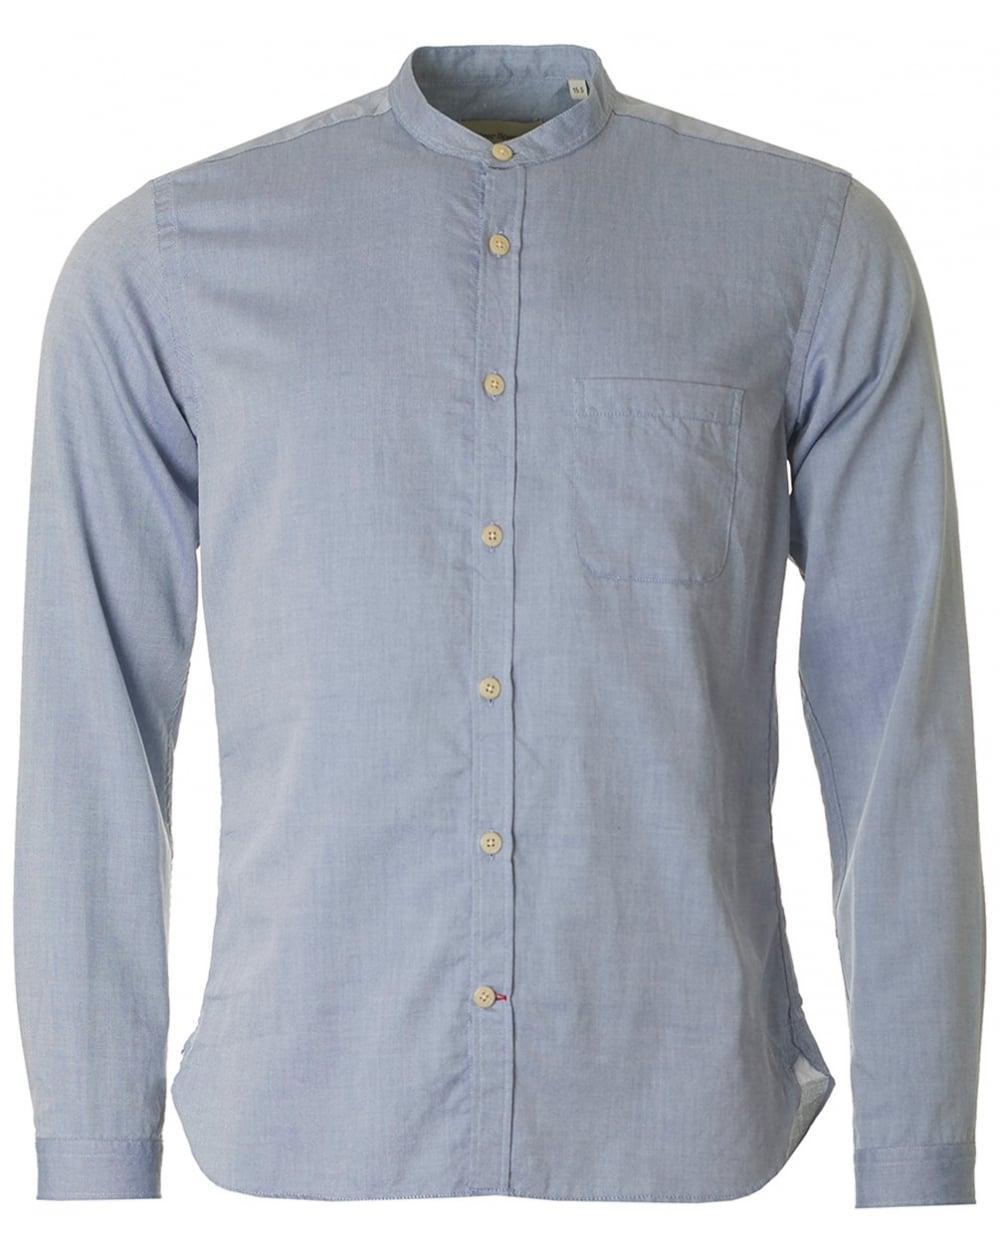 Uniqlo Linen Cotton Short Sleeve Shirt